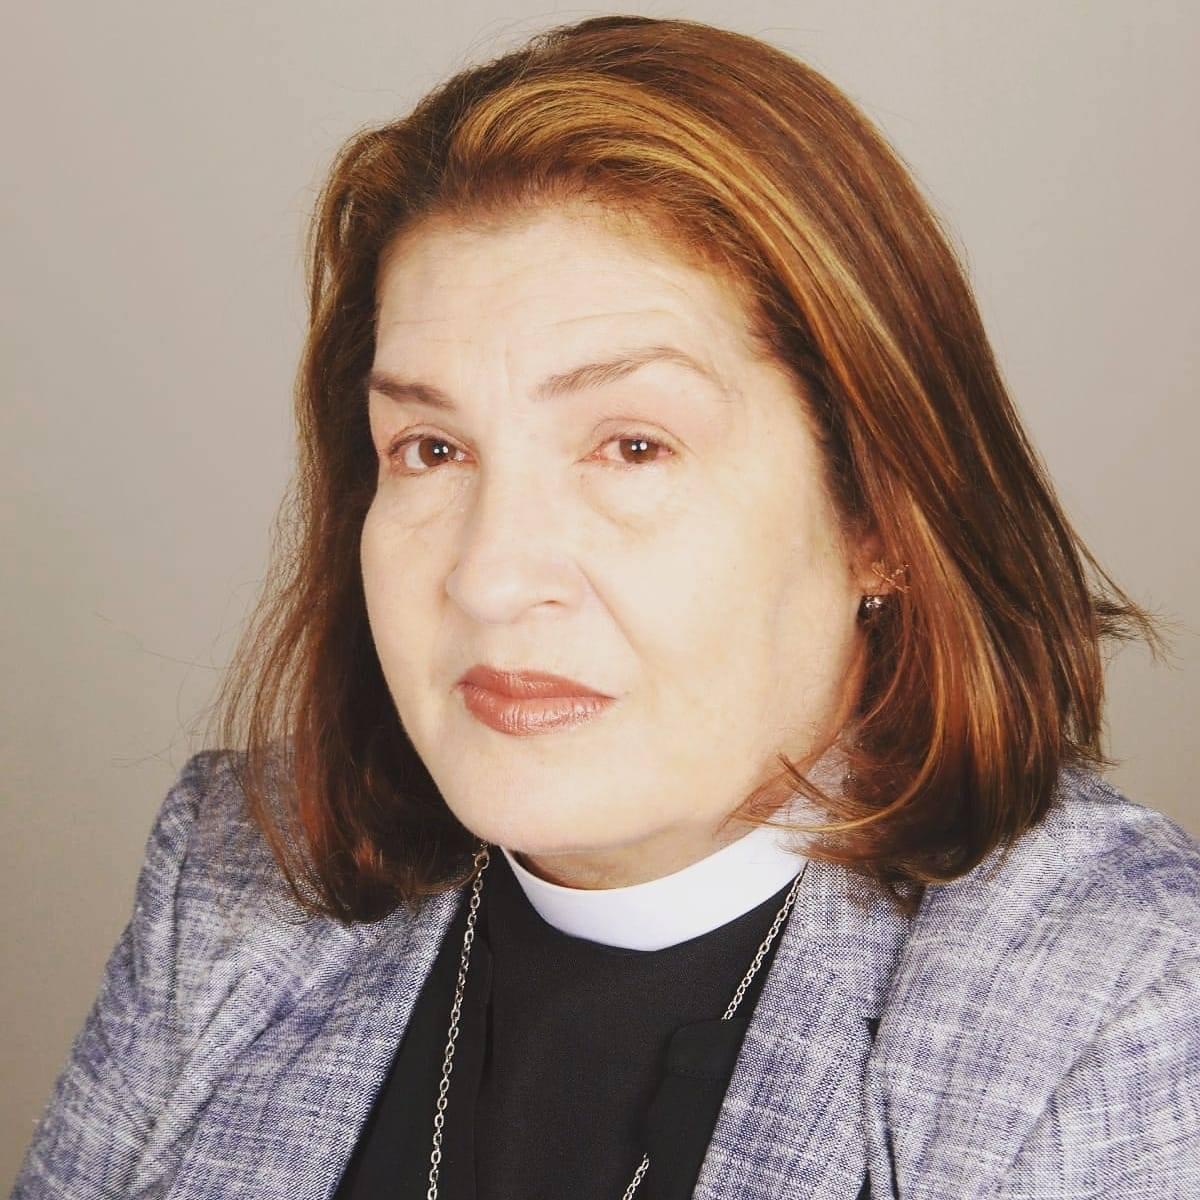 La Reverenda Maytee de la Torre